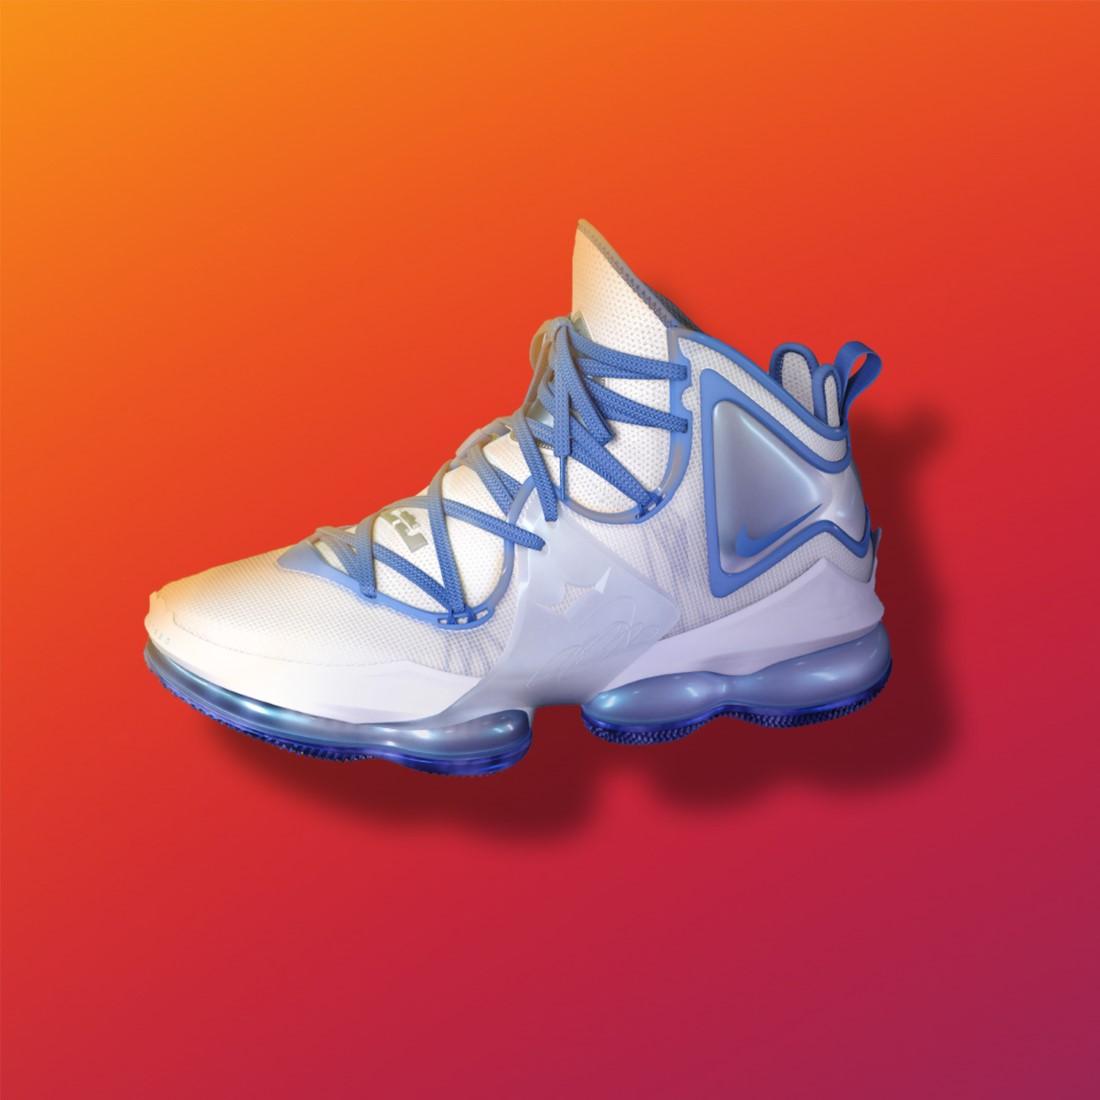 Nike LeBron 19 - Space Jam A New Legacy